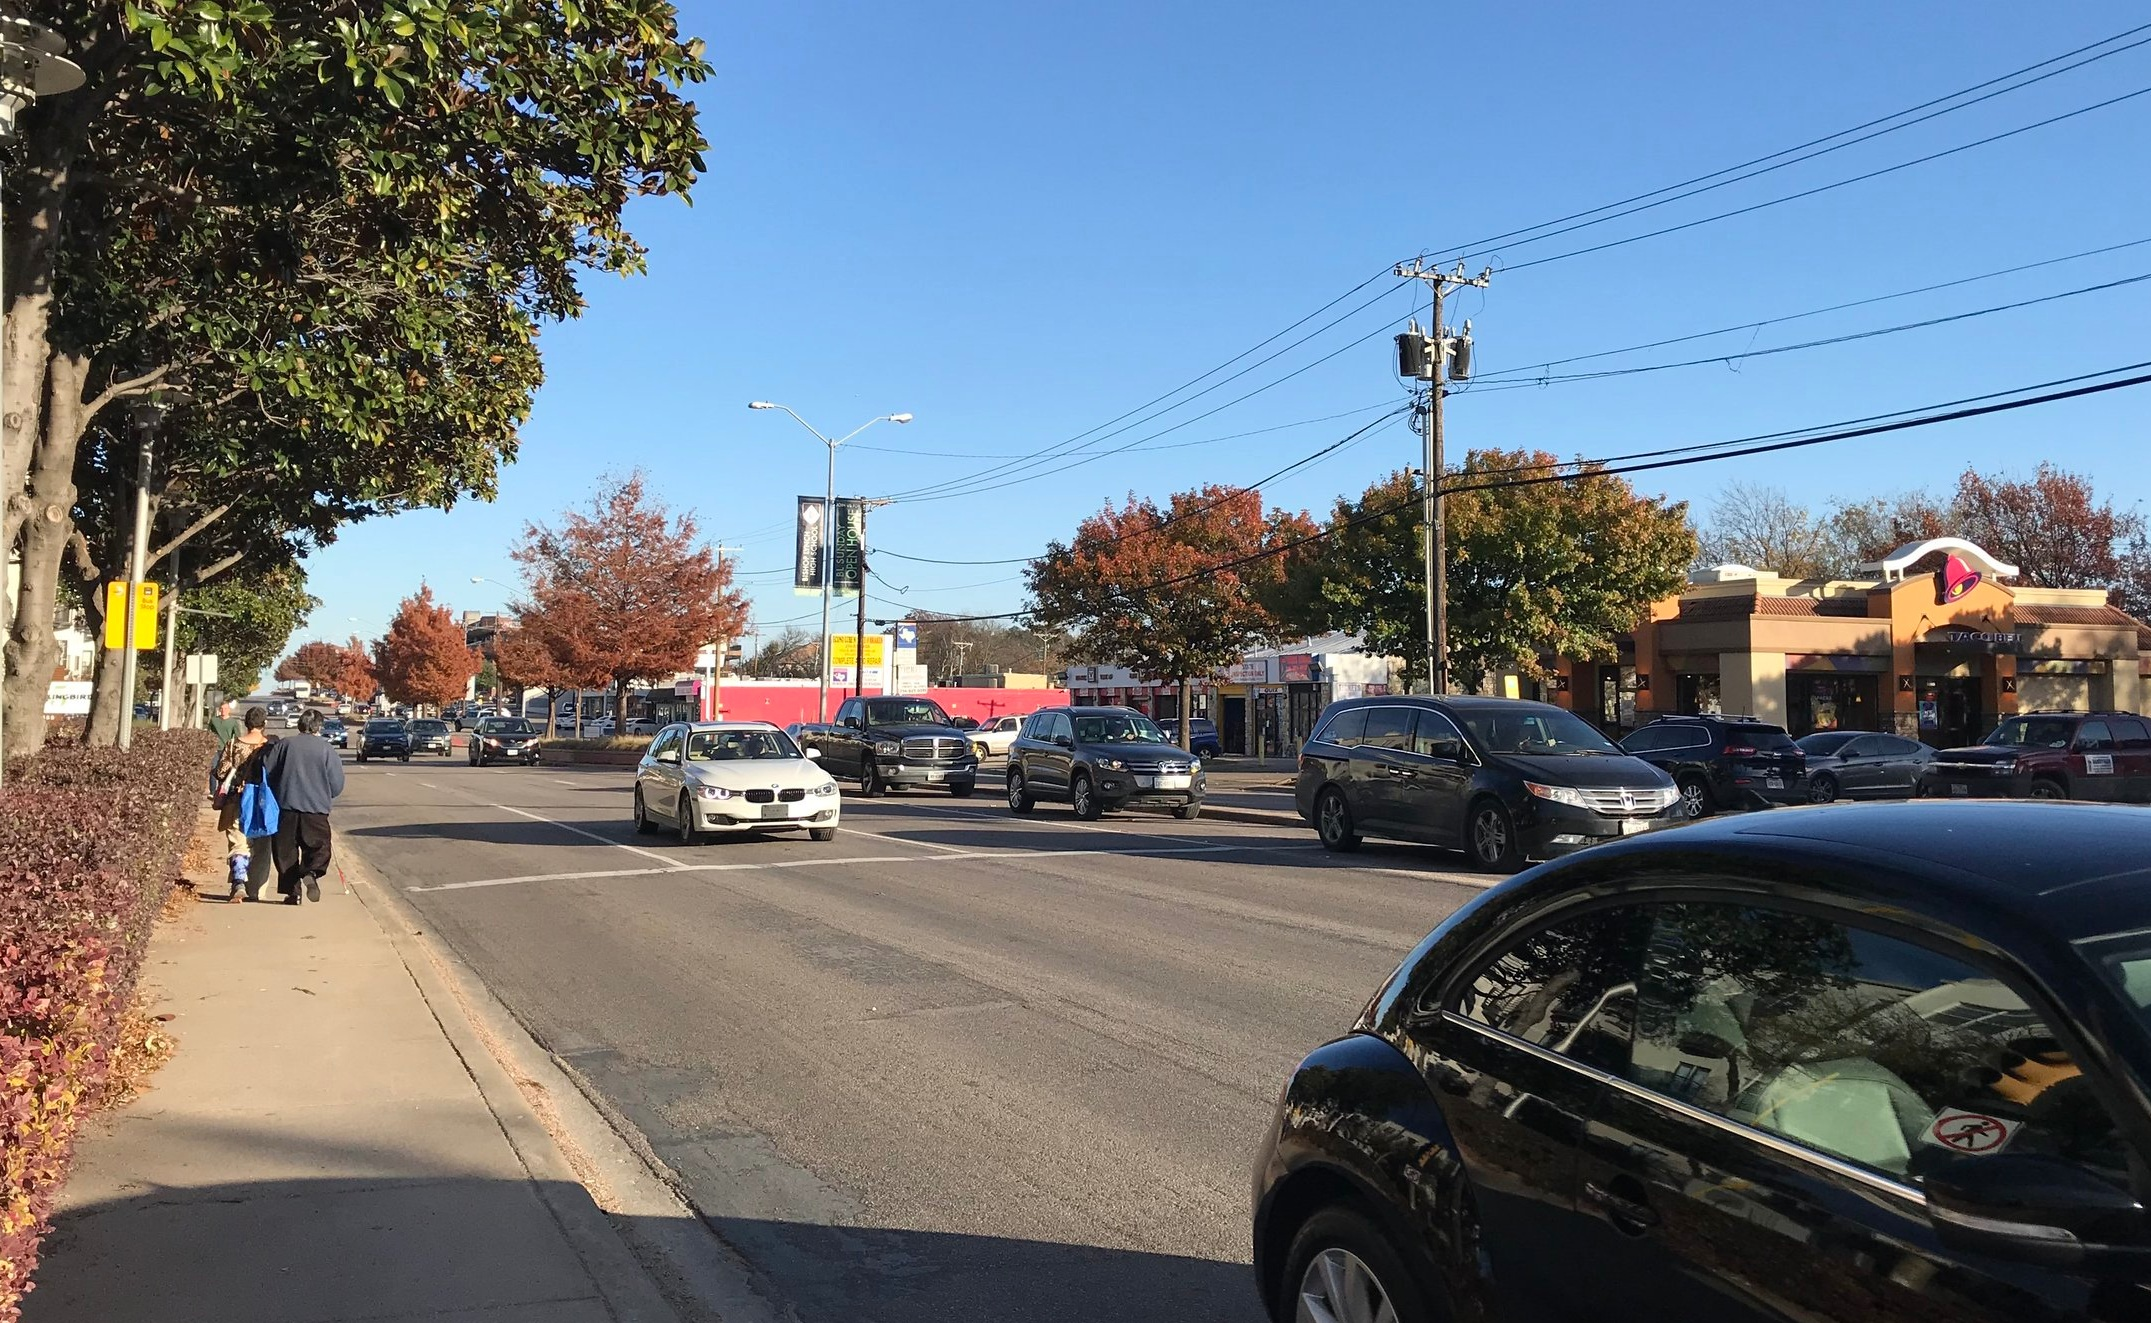 A pretty normal street in Dallas, TX. This one happens to be Mockingbird Lane, adjacent to the Mockingbird Station transit stop. (Photo: Jordan Clark)